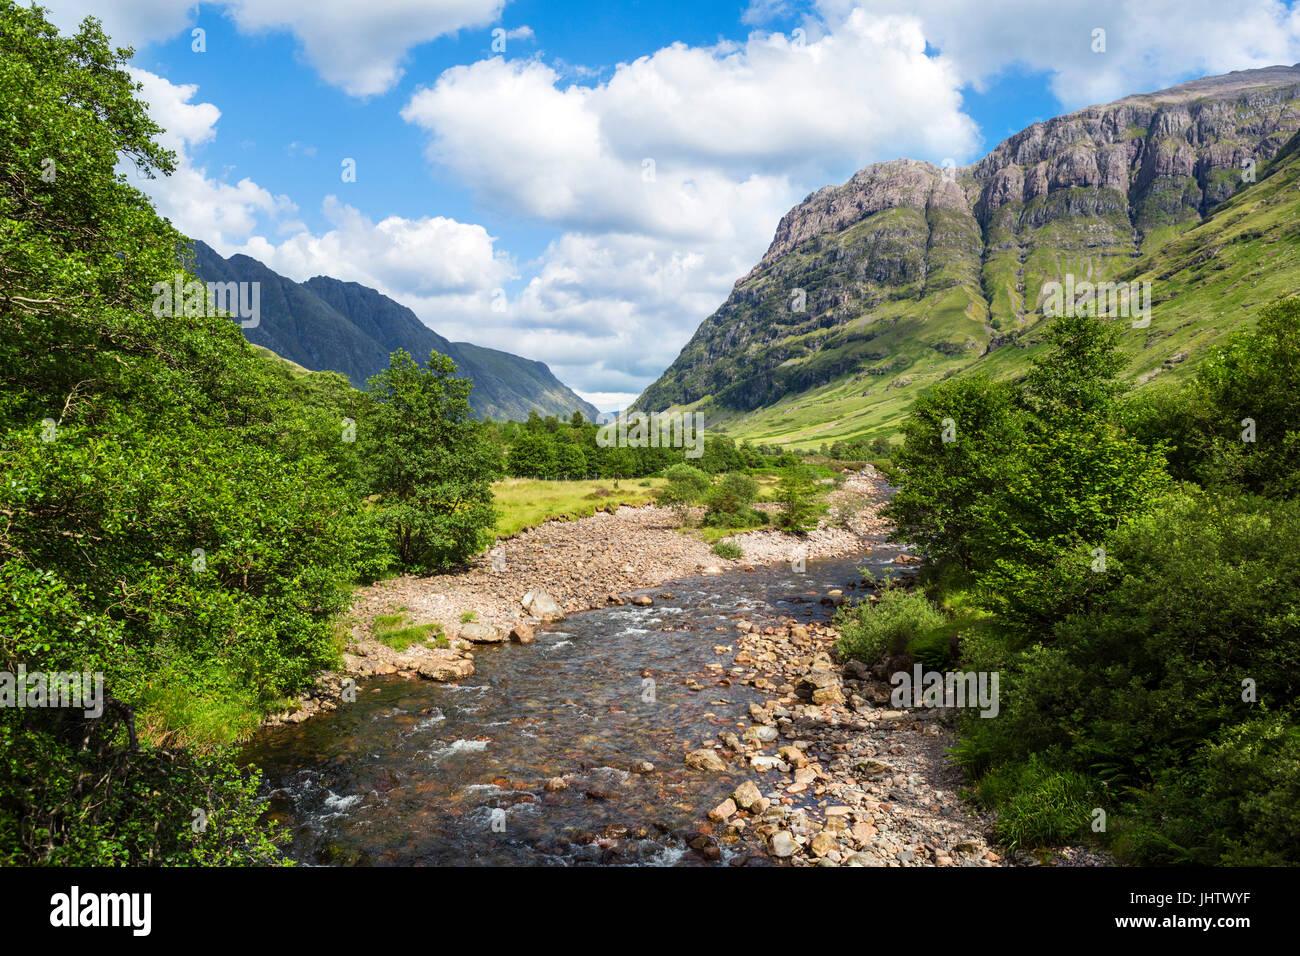 Glencoe. The River Coe near Signal Rock and An Torr, Glencoe, Scottish Highlands, Scotland, UK Stock Photo